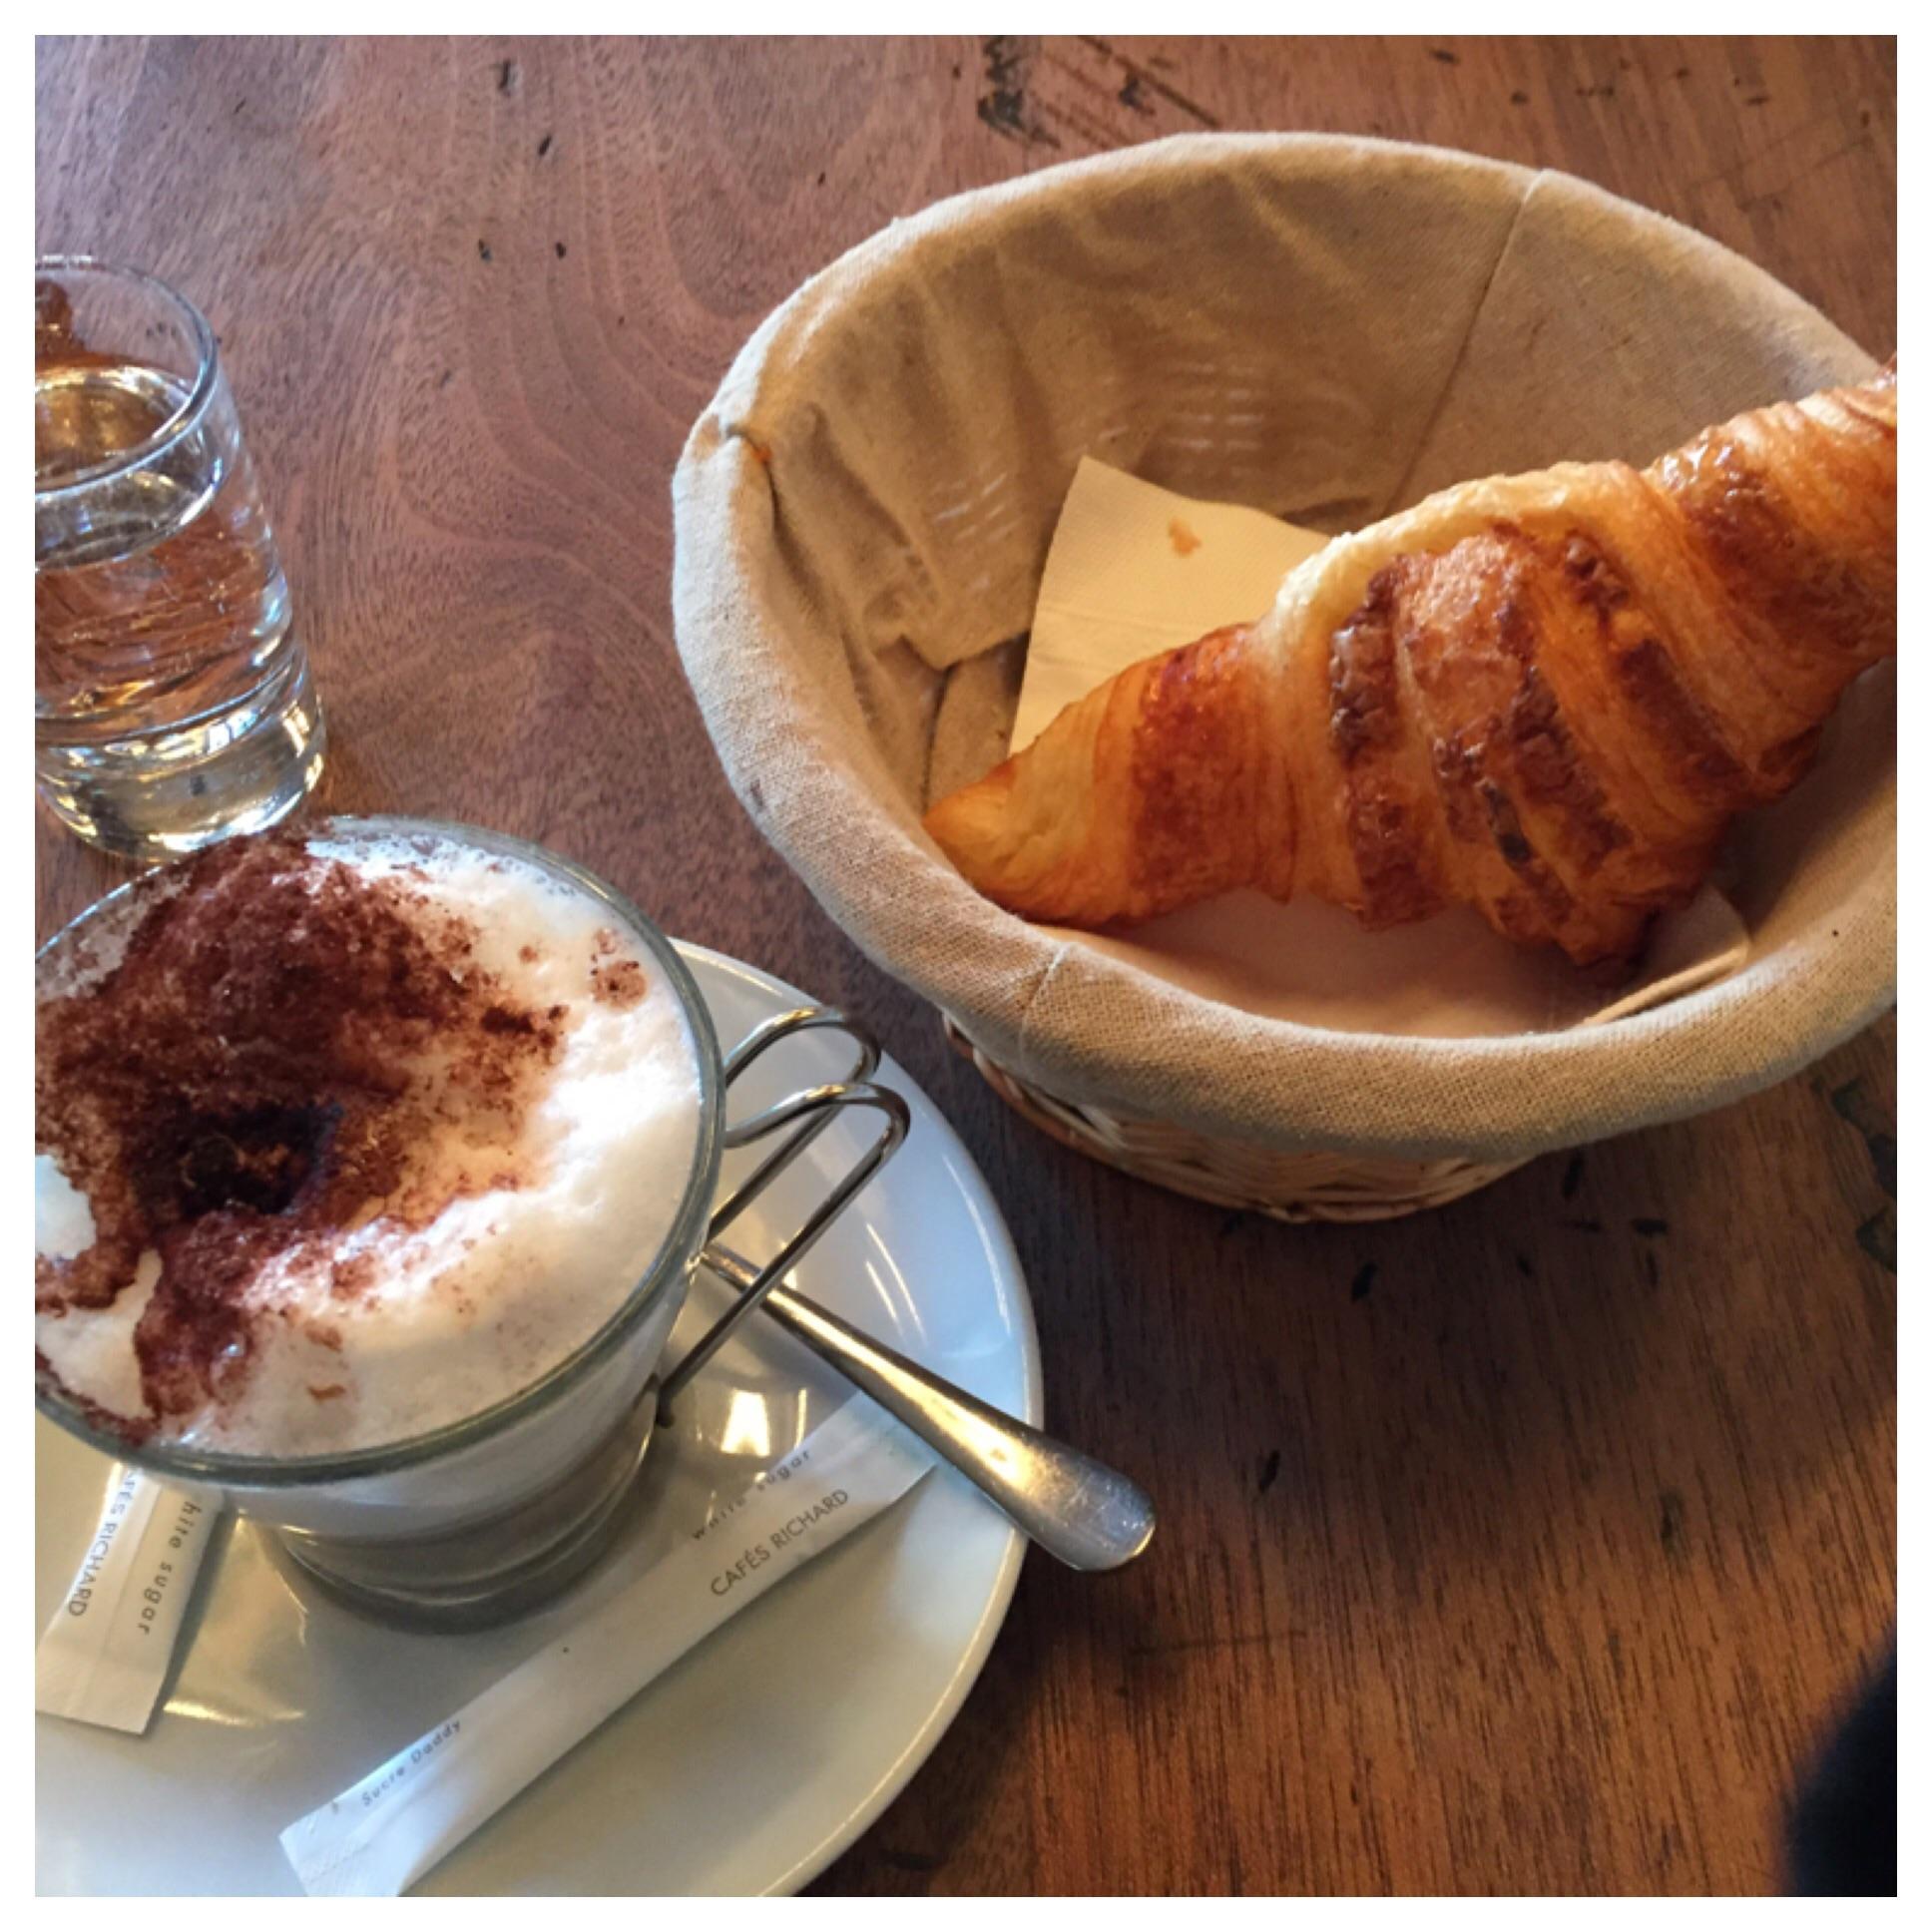 Cappucino and Croissant!!